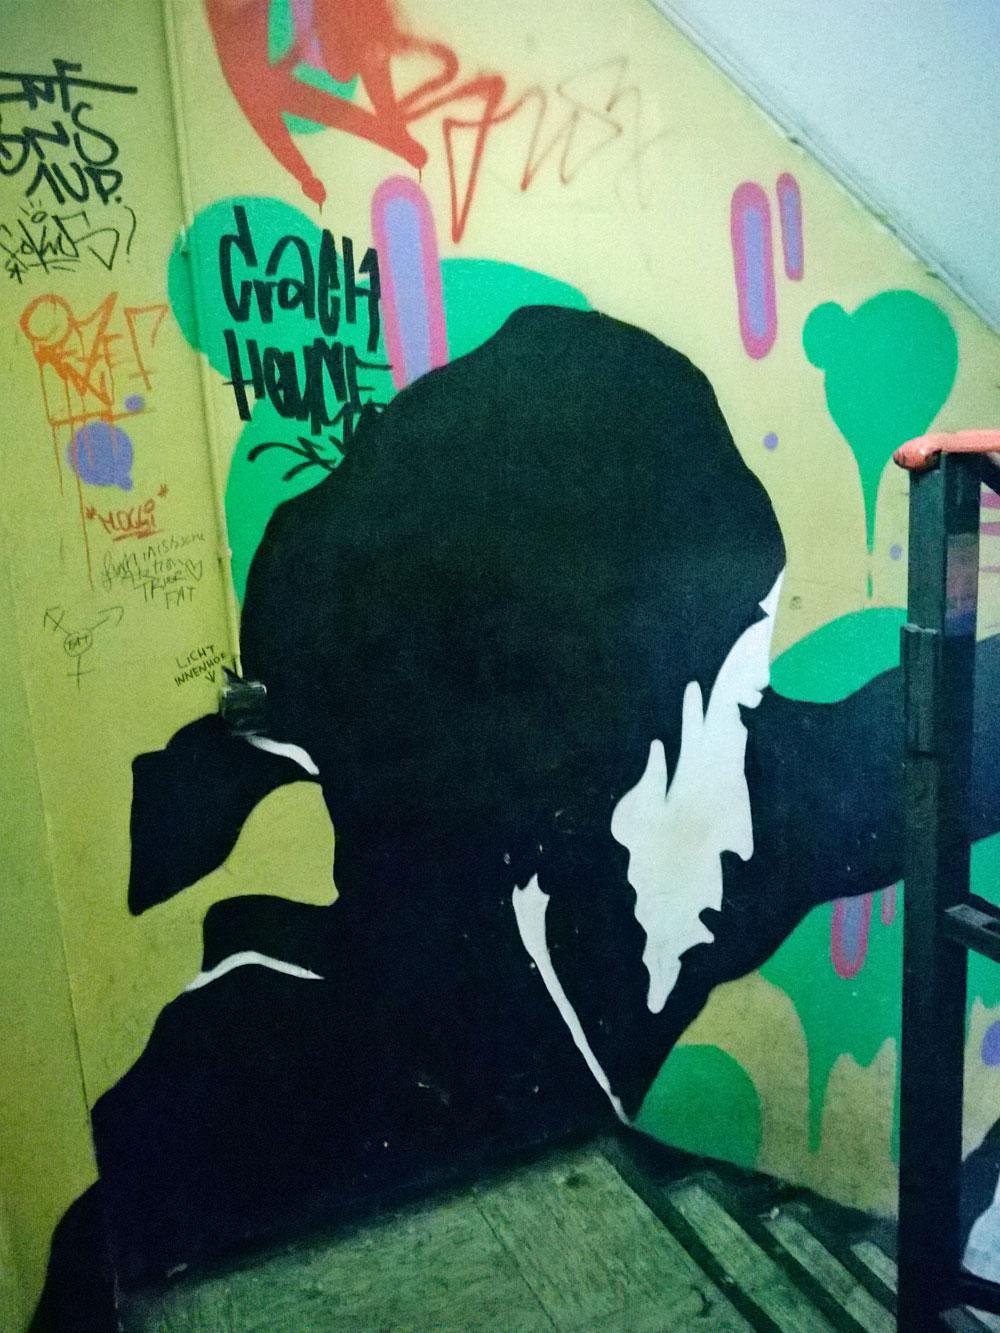 streetart-frankfrut-klapperfeld